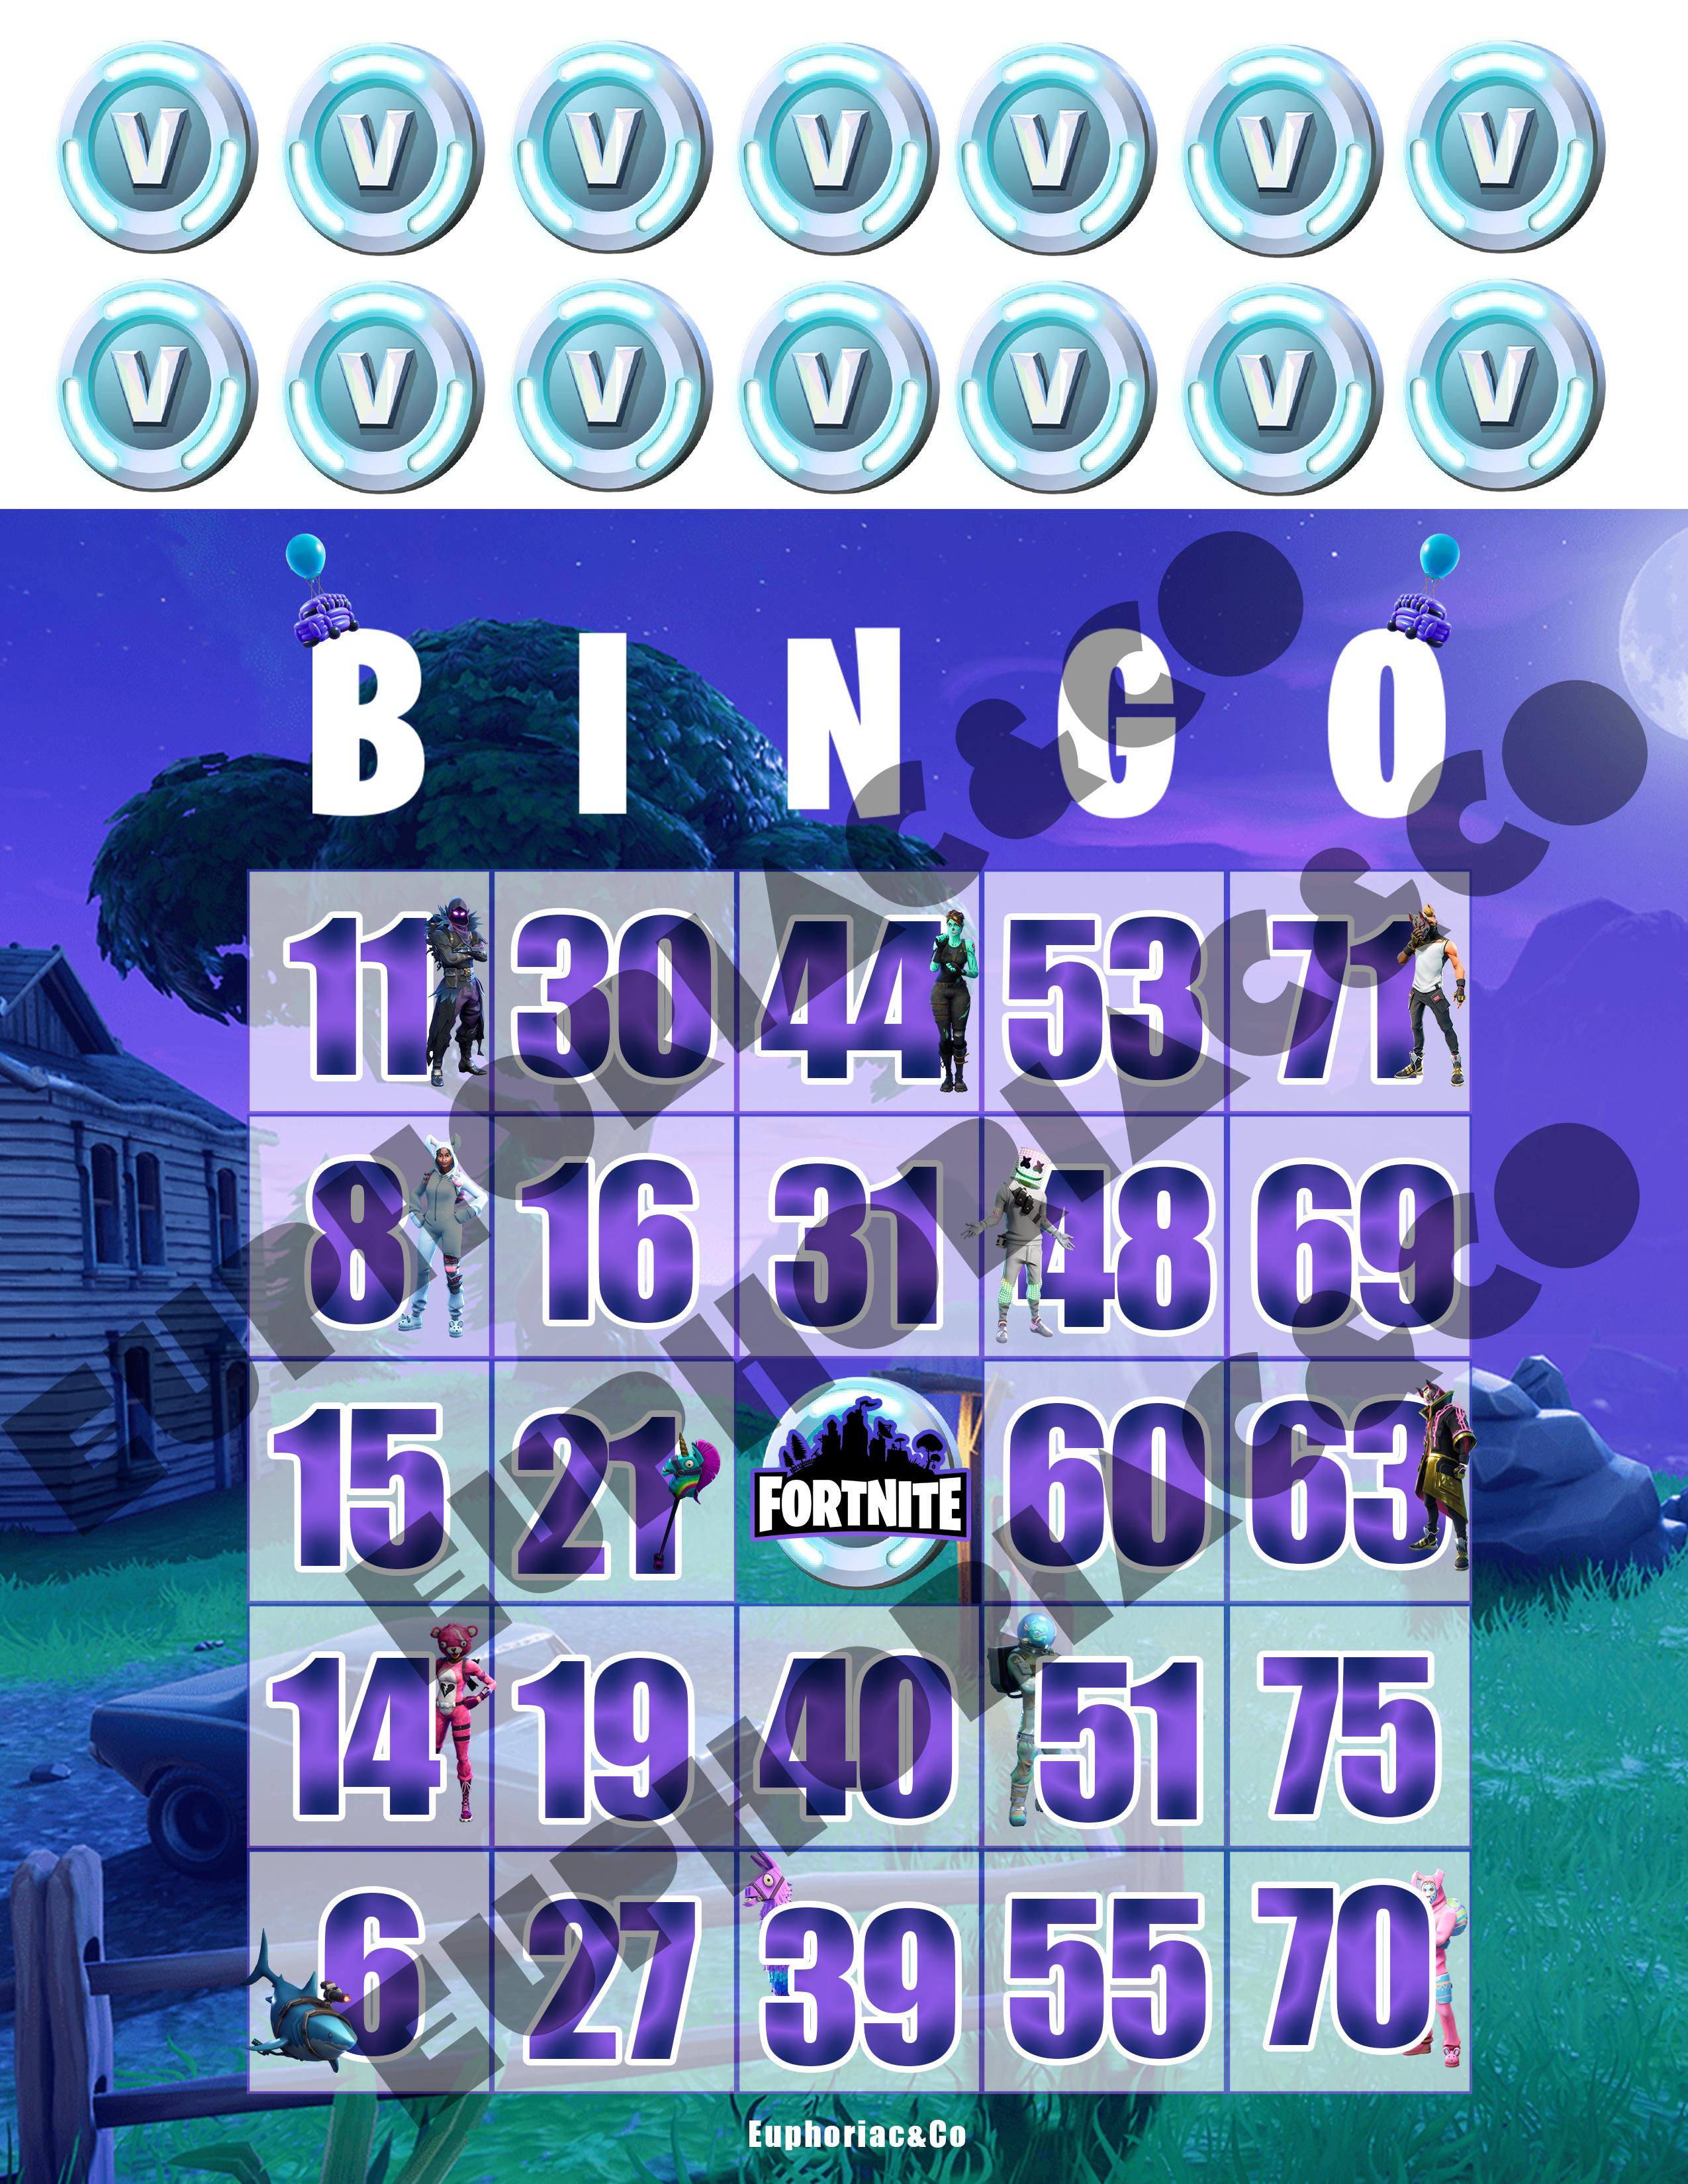 Fortnite Bingo Card Bingo Cards Football Party Bingo